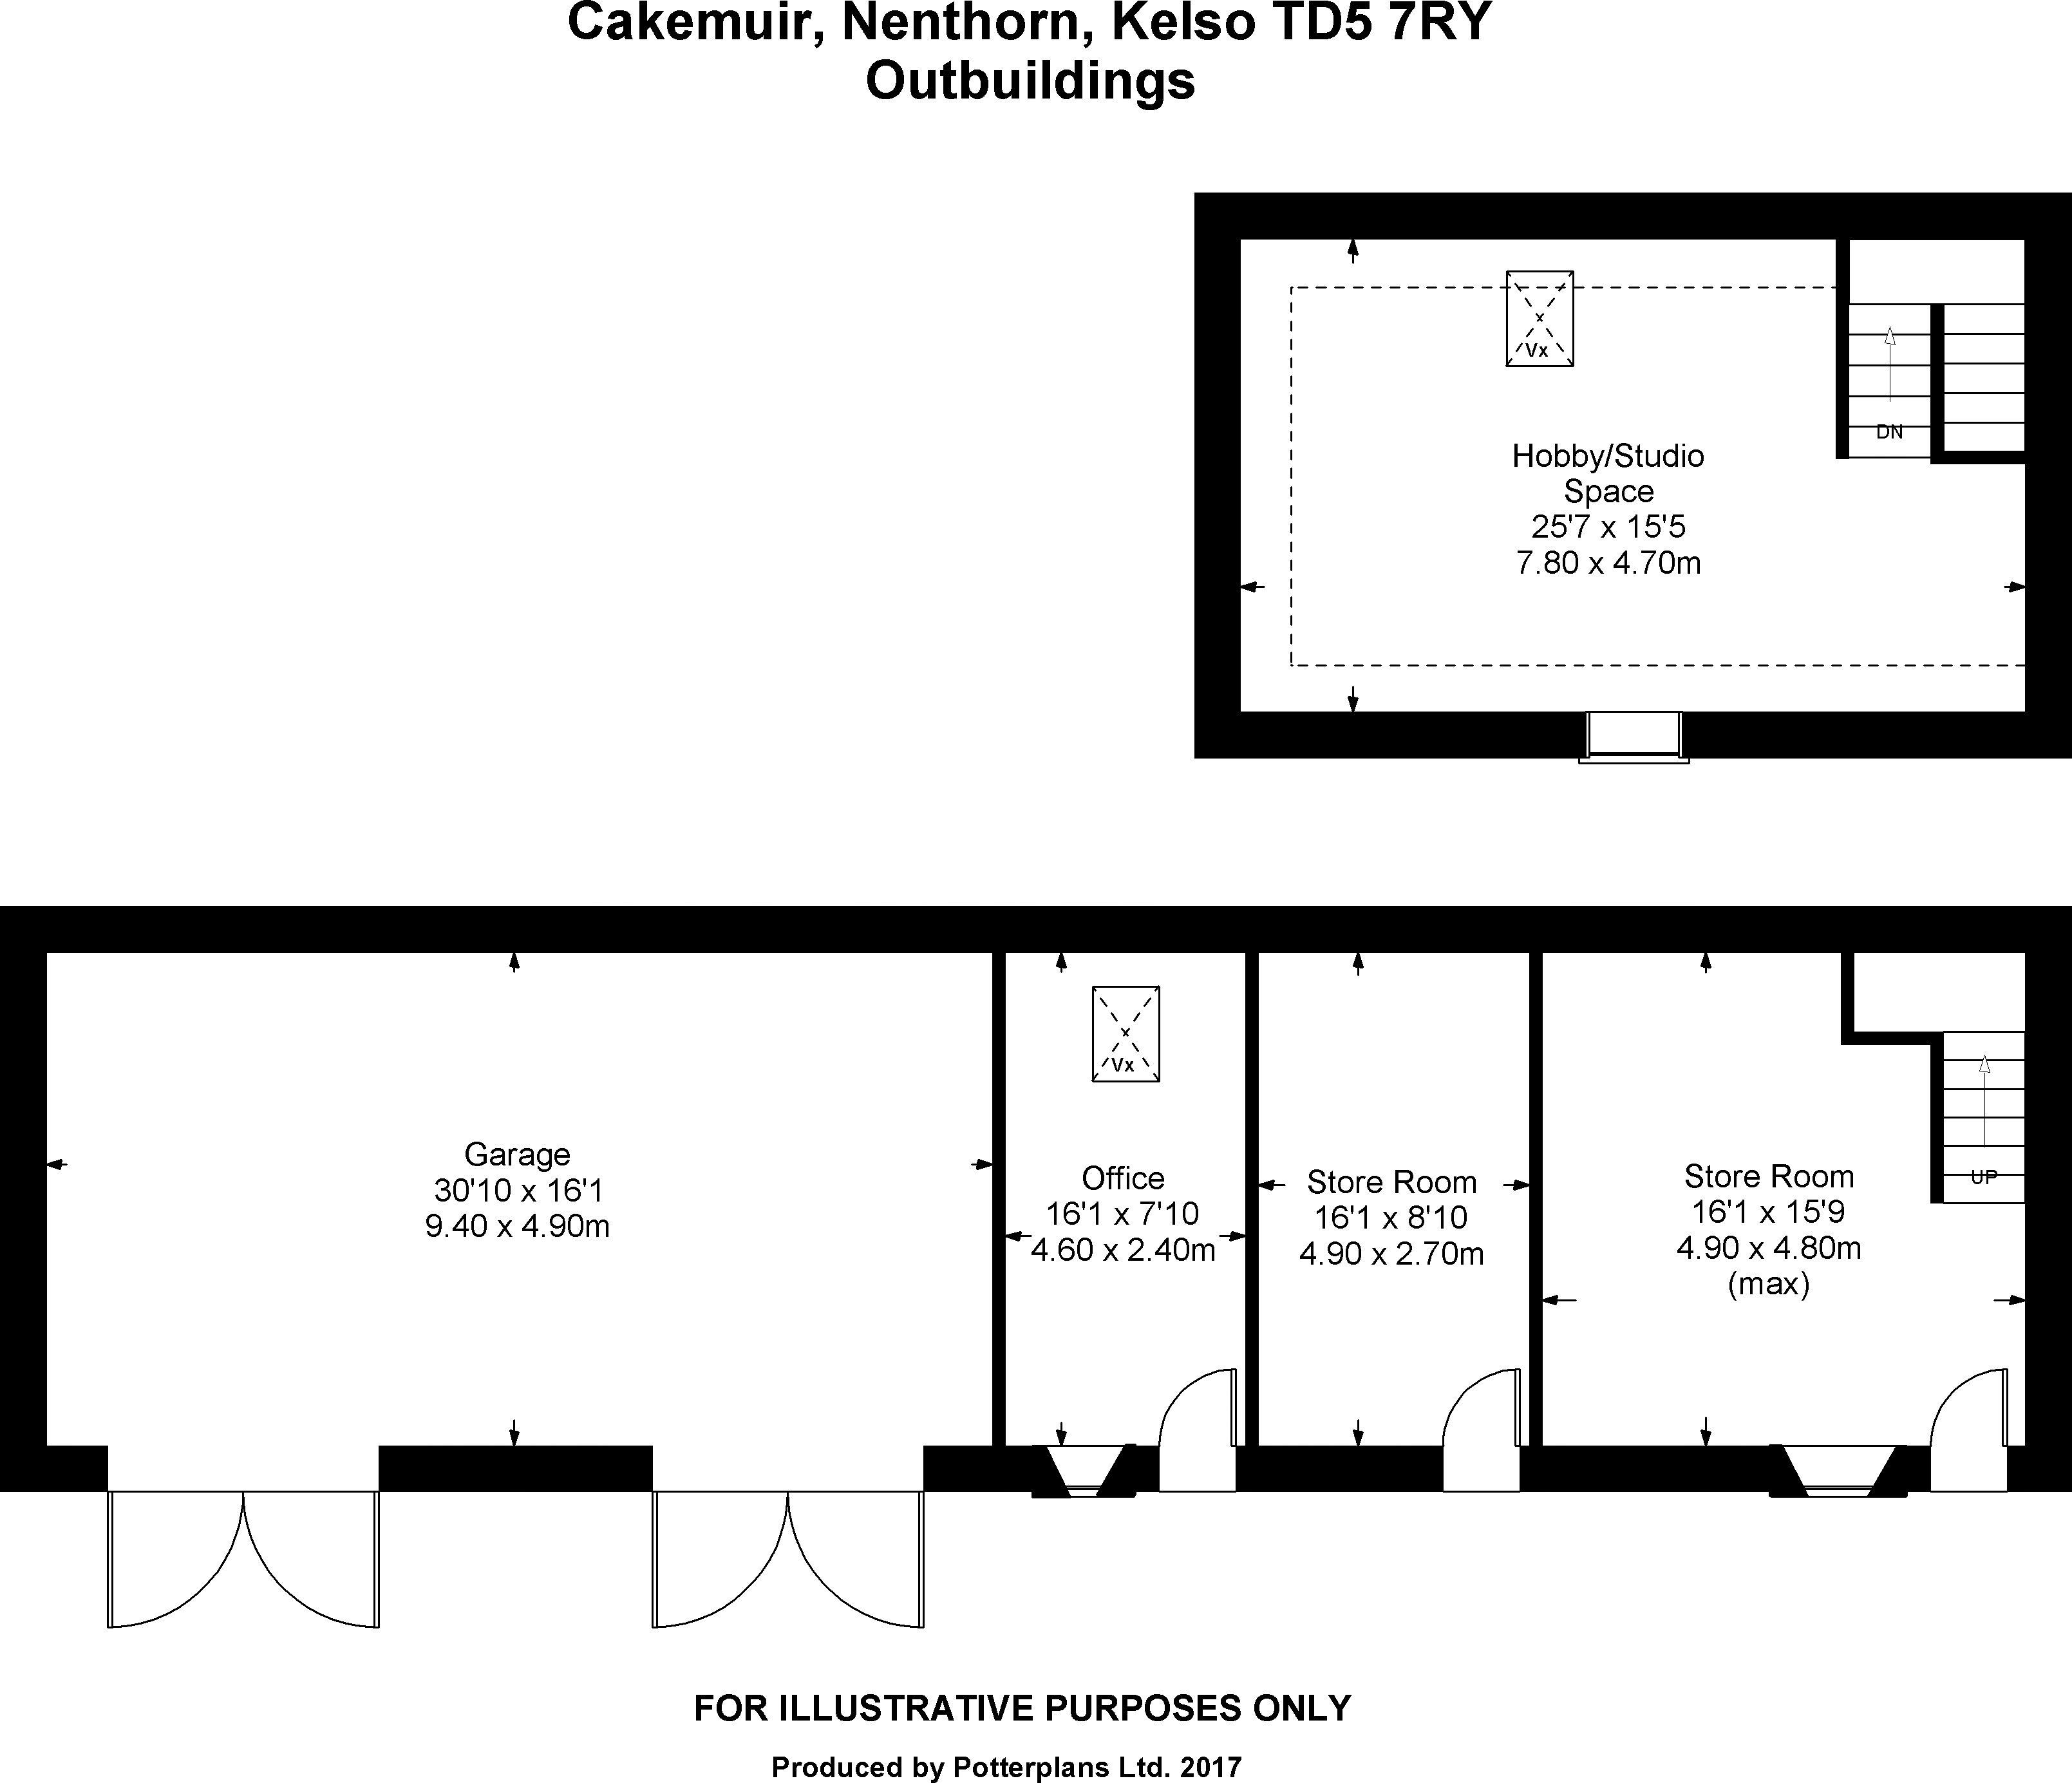 Cakemuir Outbuildings